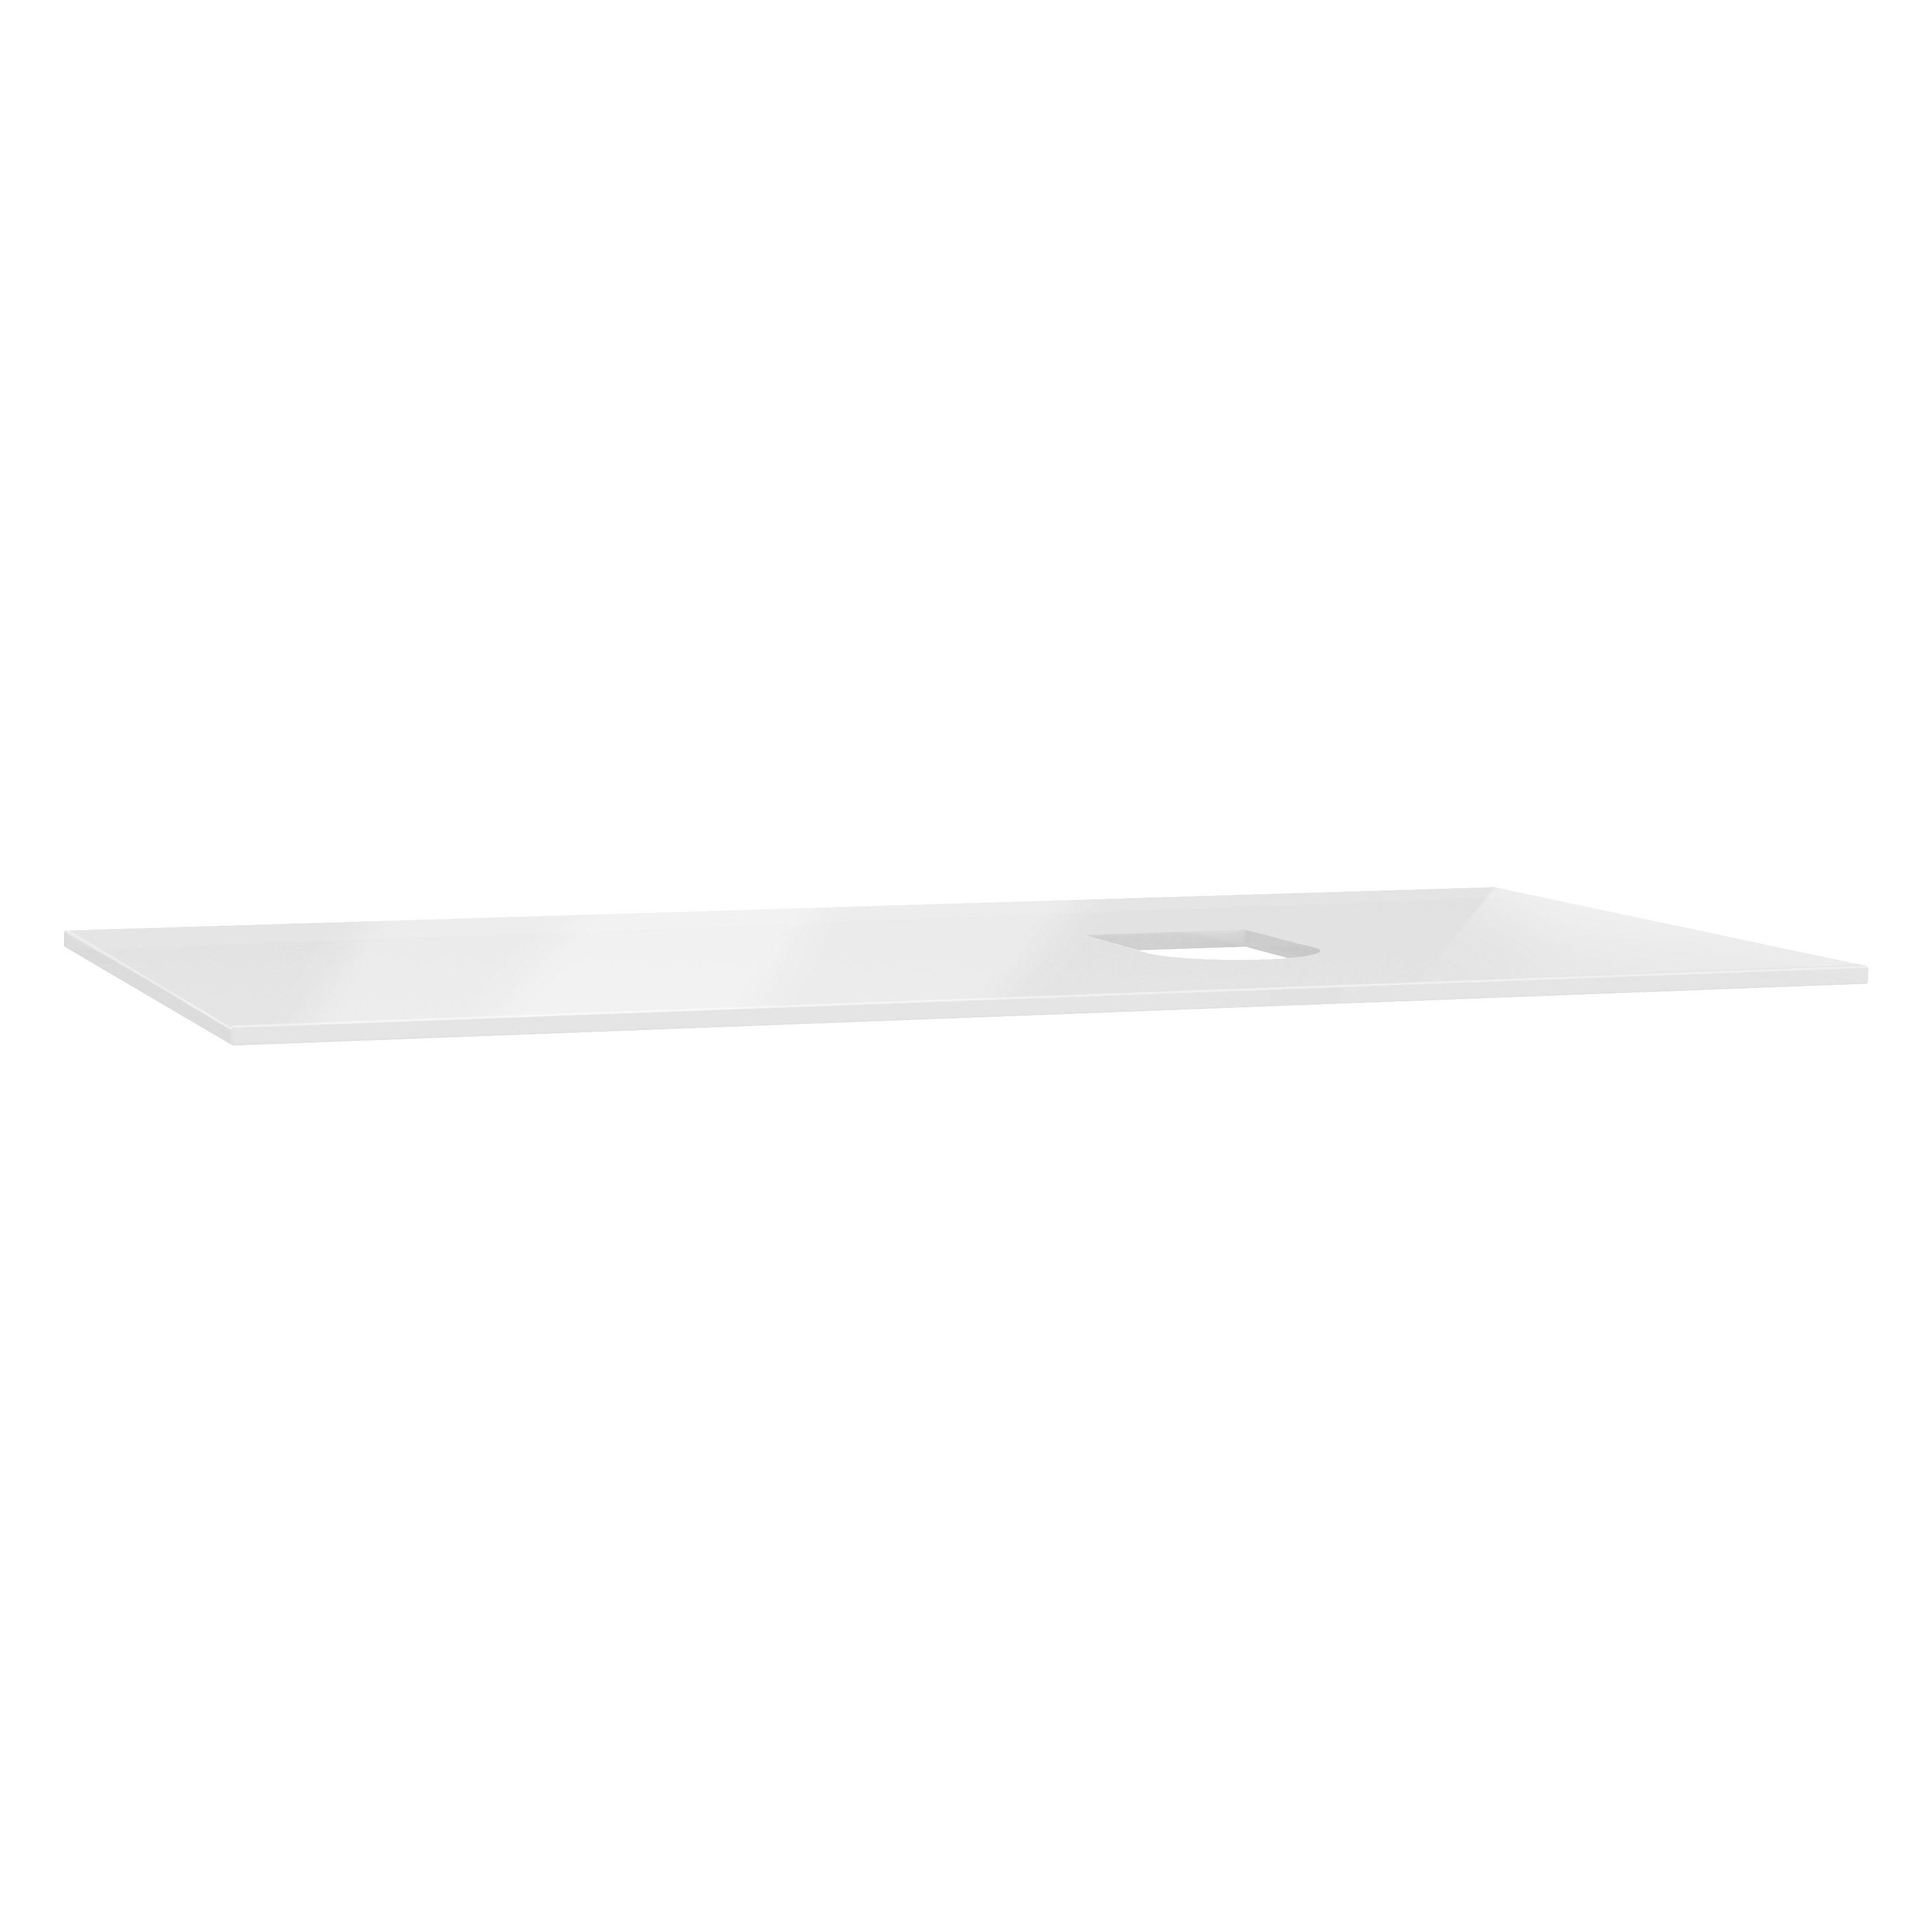 Origin plan de toilette, 90 cm, verre blanc, droite